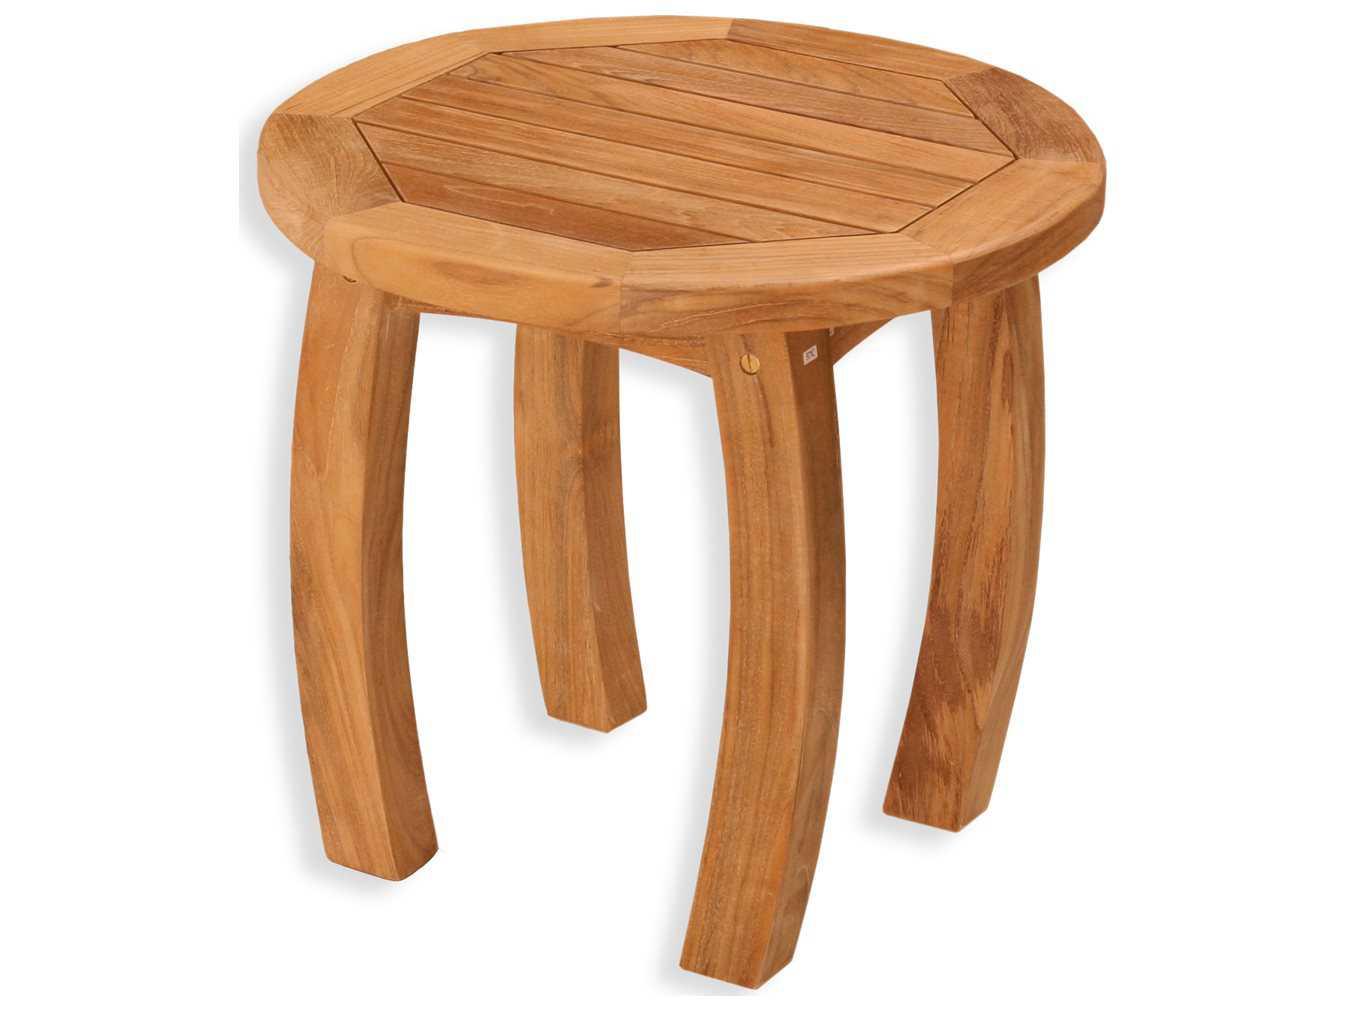 Tortuga outdoor jakarta teak 20 round side table tk r st for Outdoor teak side table